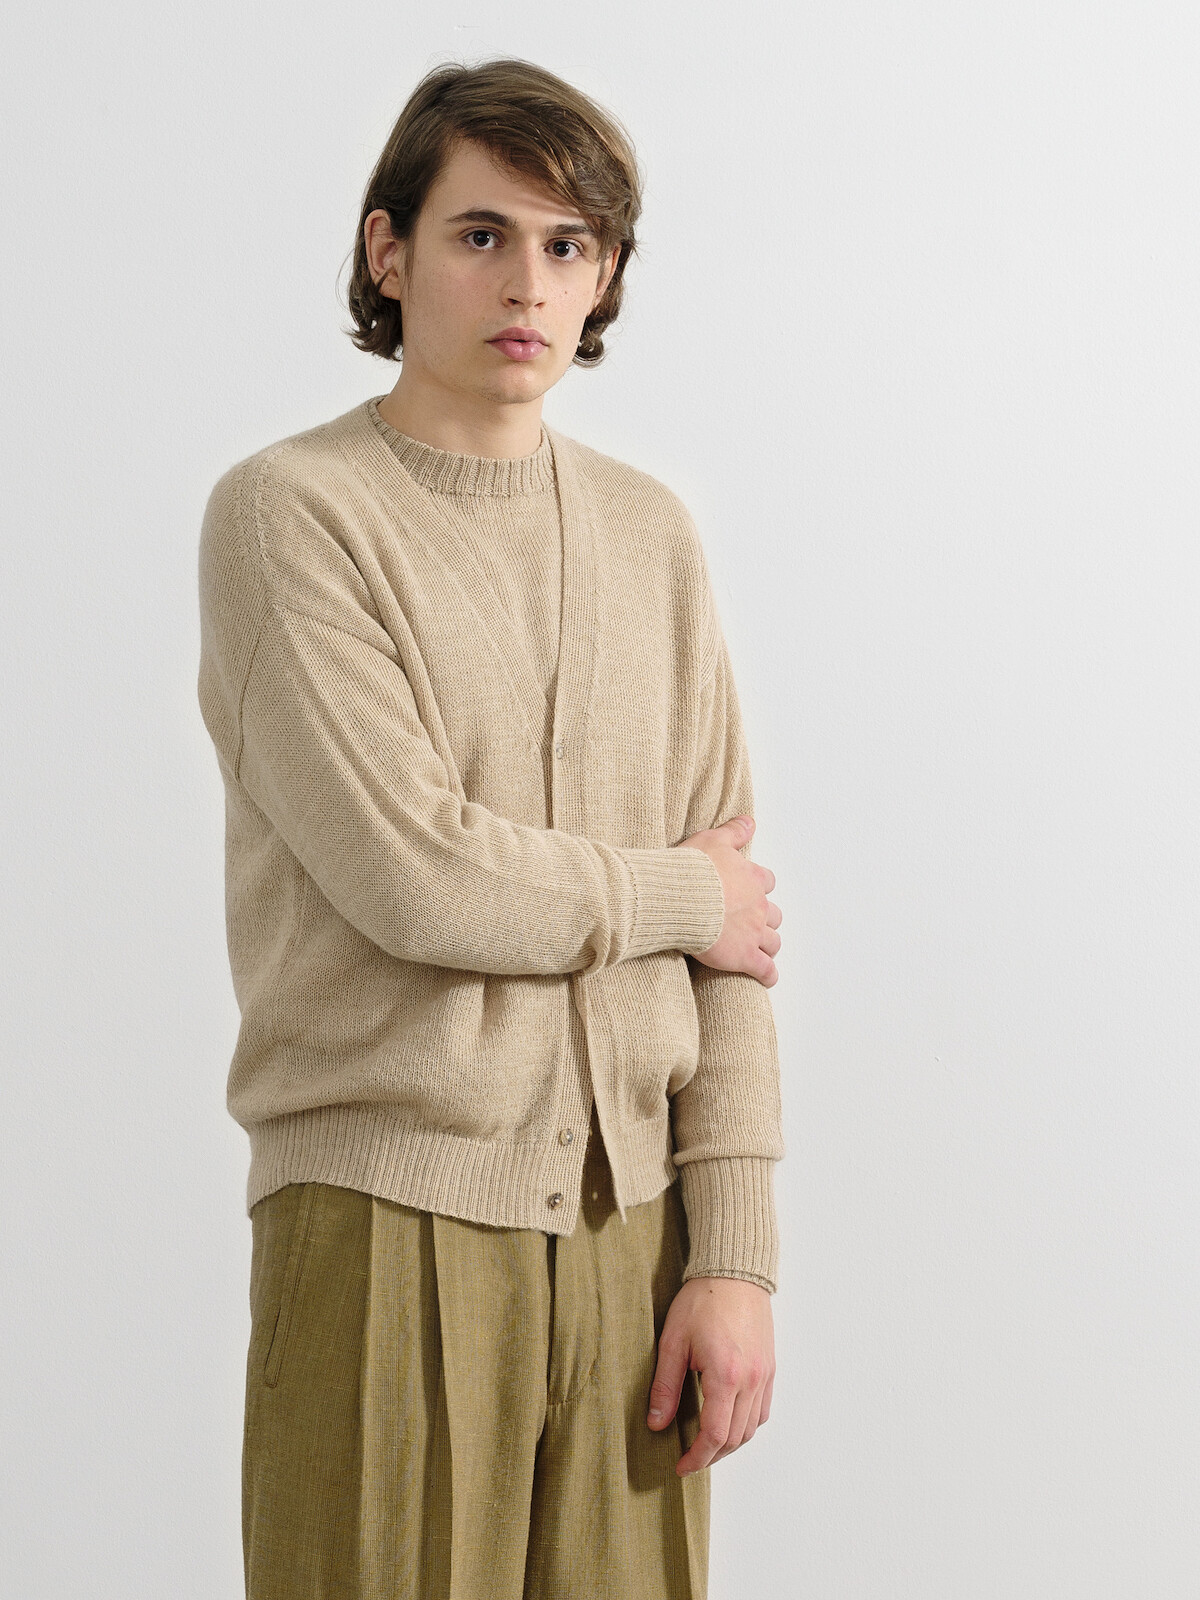 the Light-cardigan Image